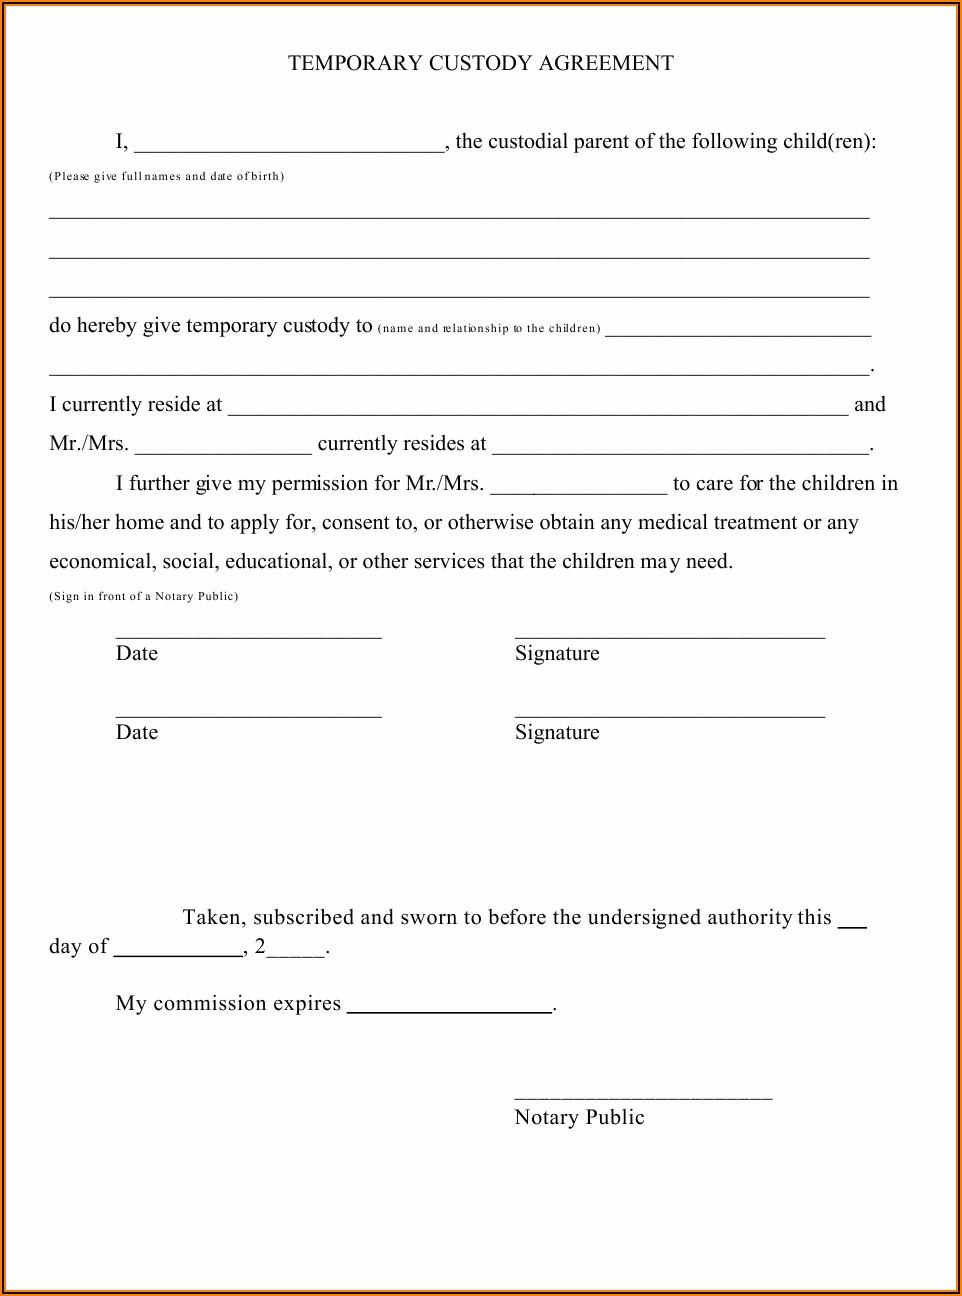 Temporary Custody Form Pdf